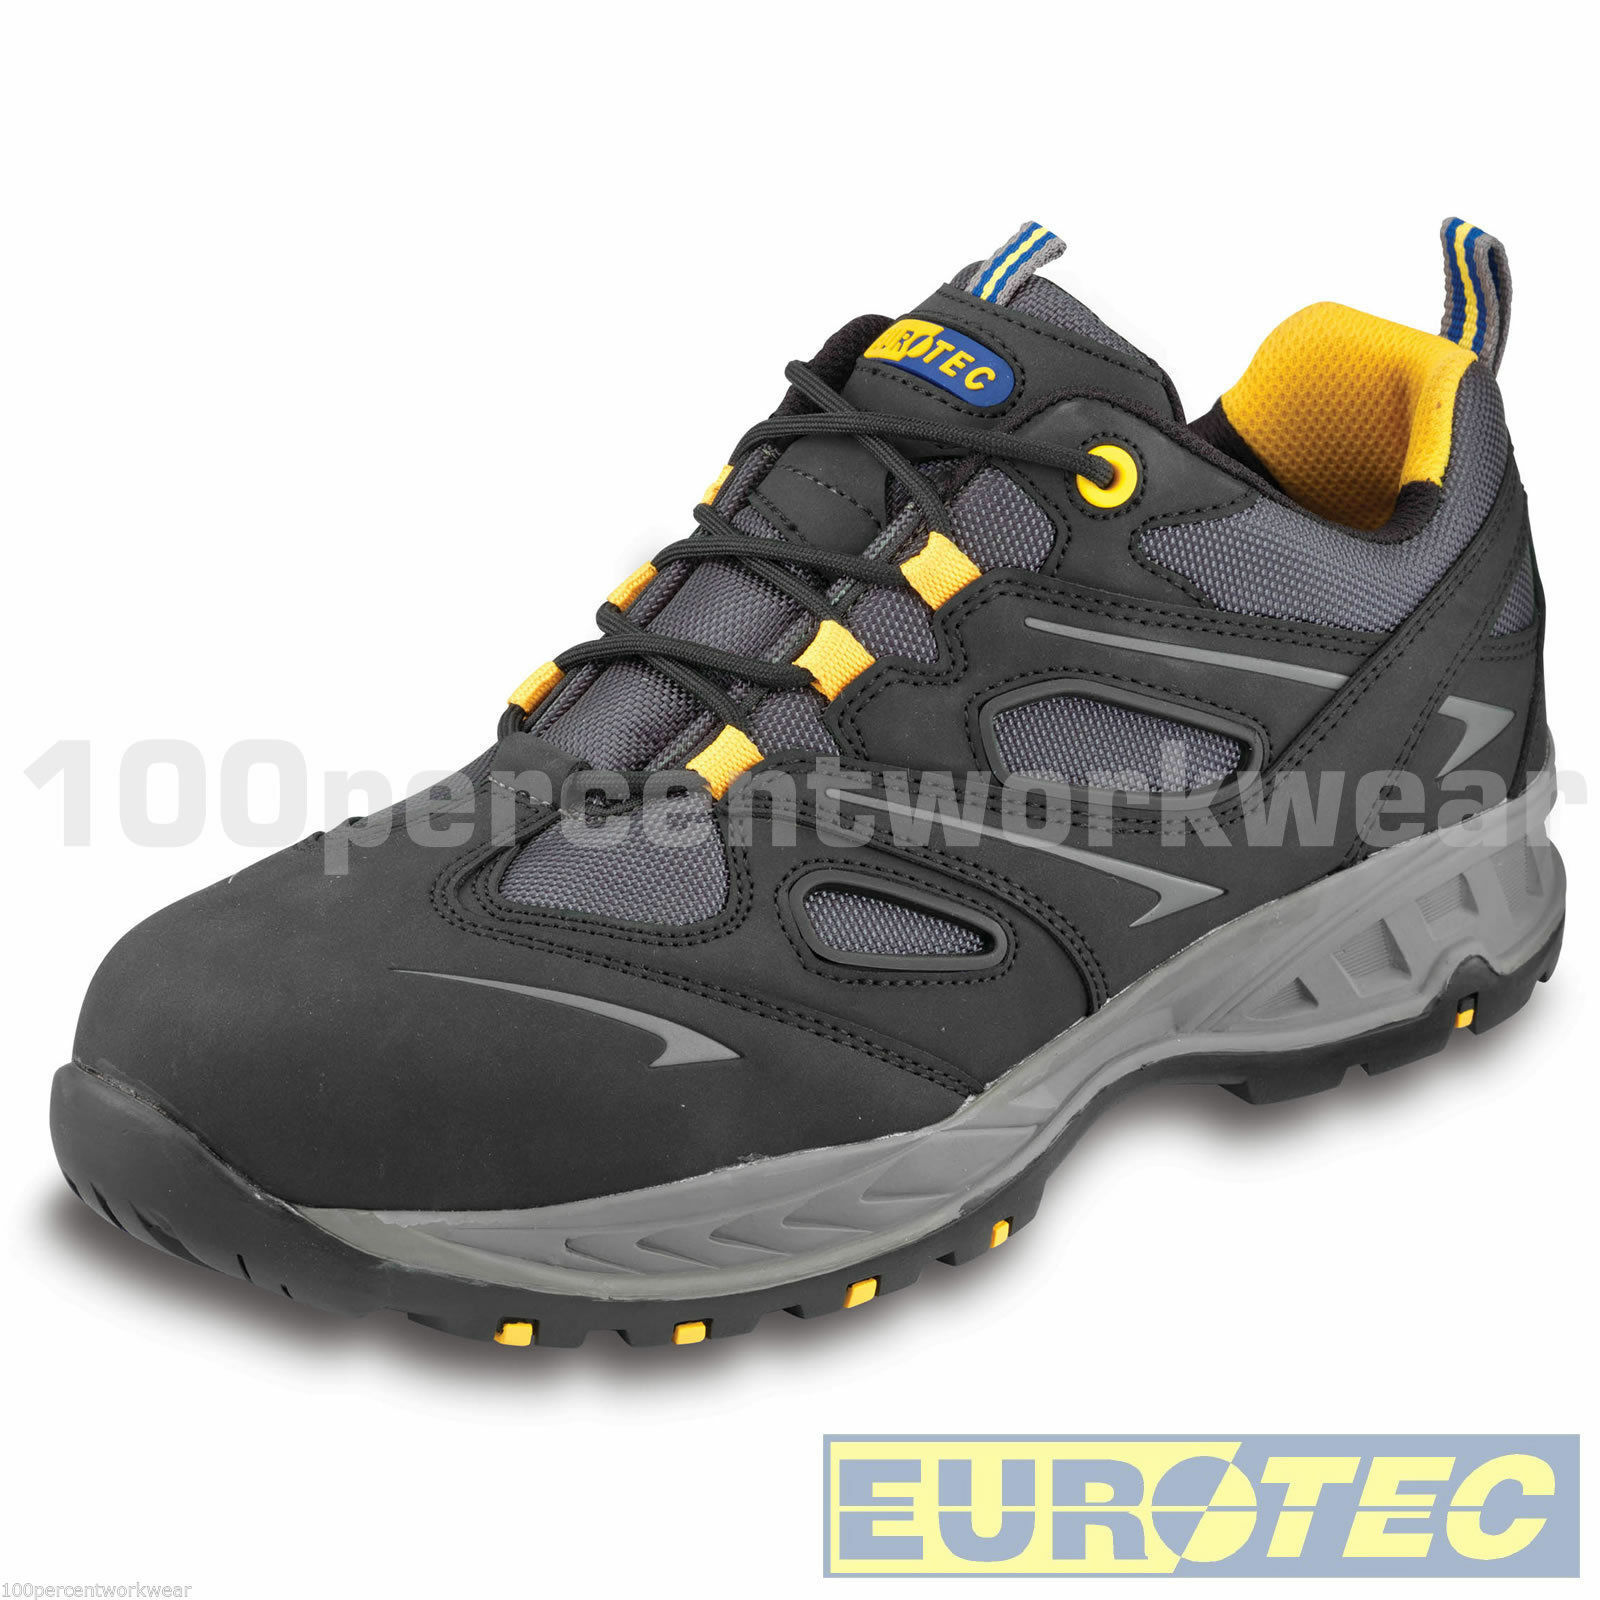 Taglia EURO 43 43 EURO Eurotec 715NMP nera in pelle di nabuk Mesh di sicurezza Scarpe da ginnastica NUOVO 363145